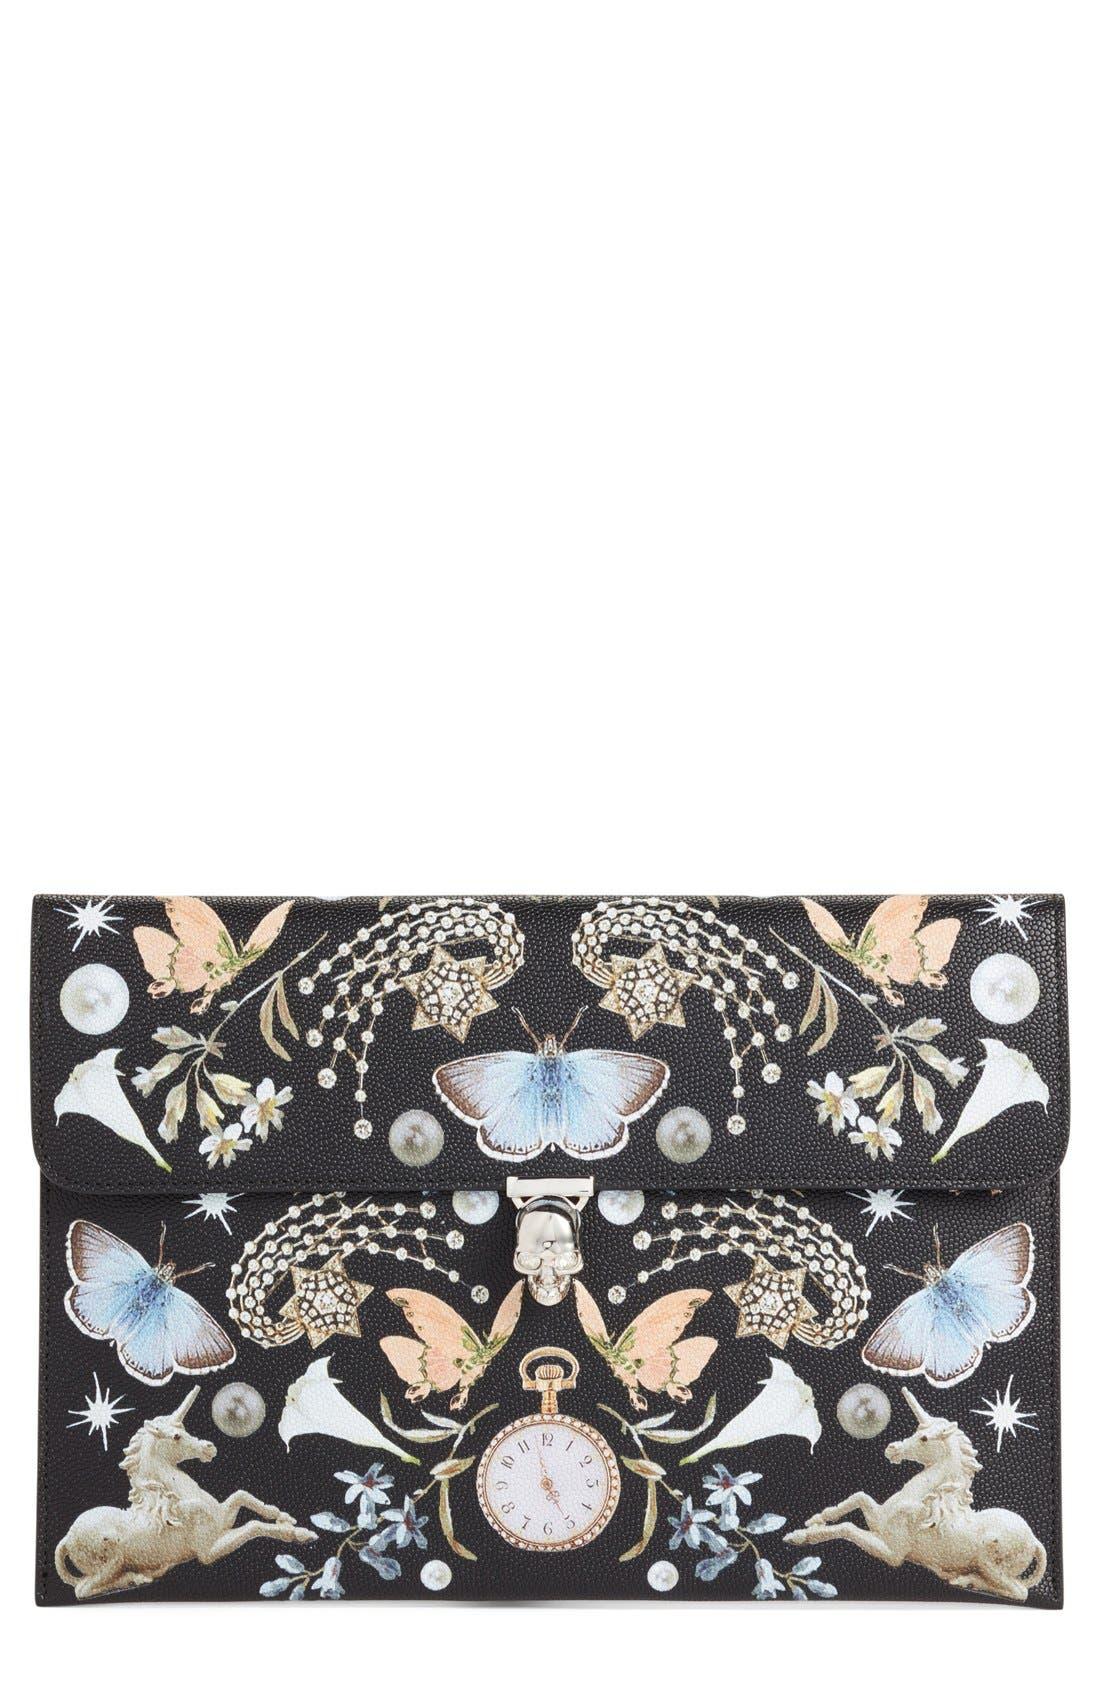 Alternate Image 1 Selected - Alexander McQueen 'Nocturnal Skull' Calfskin Leather Clutch